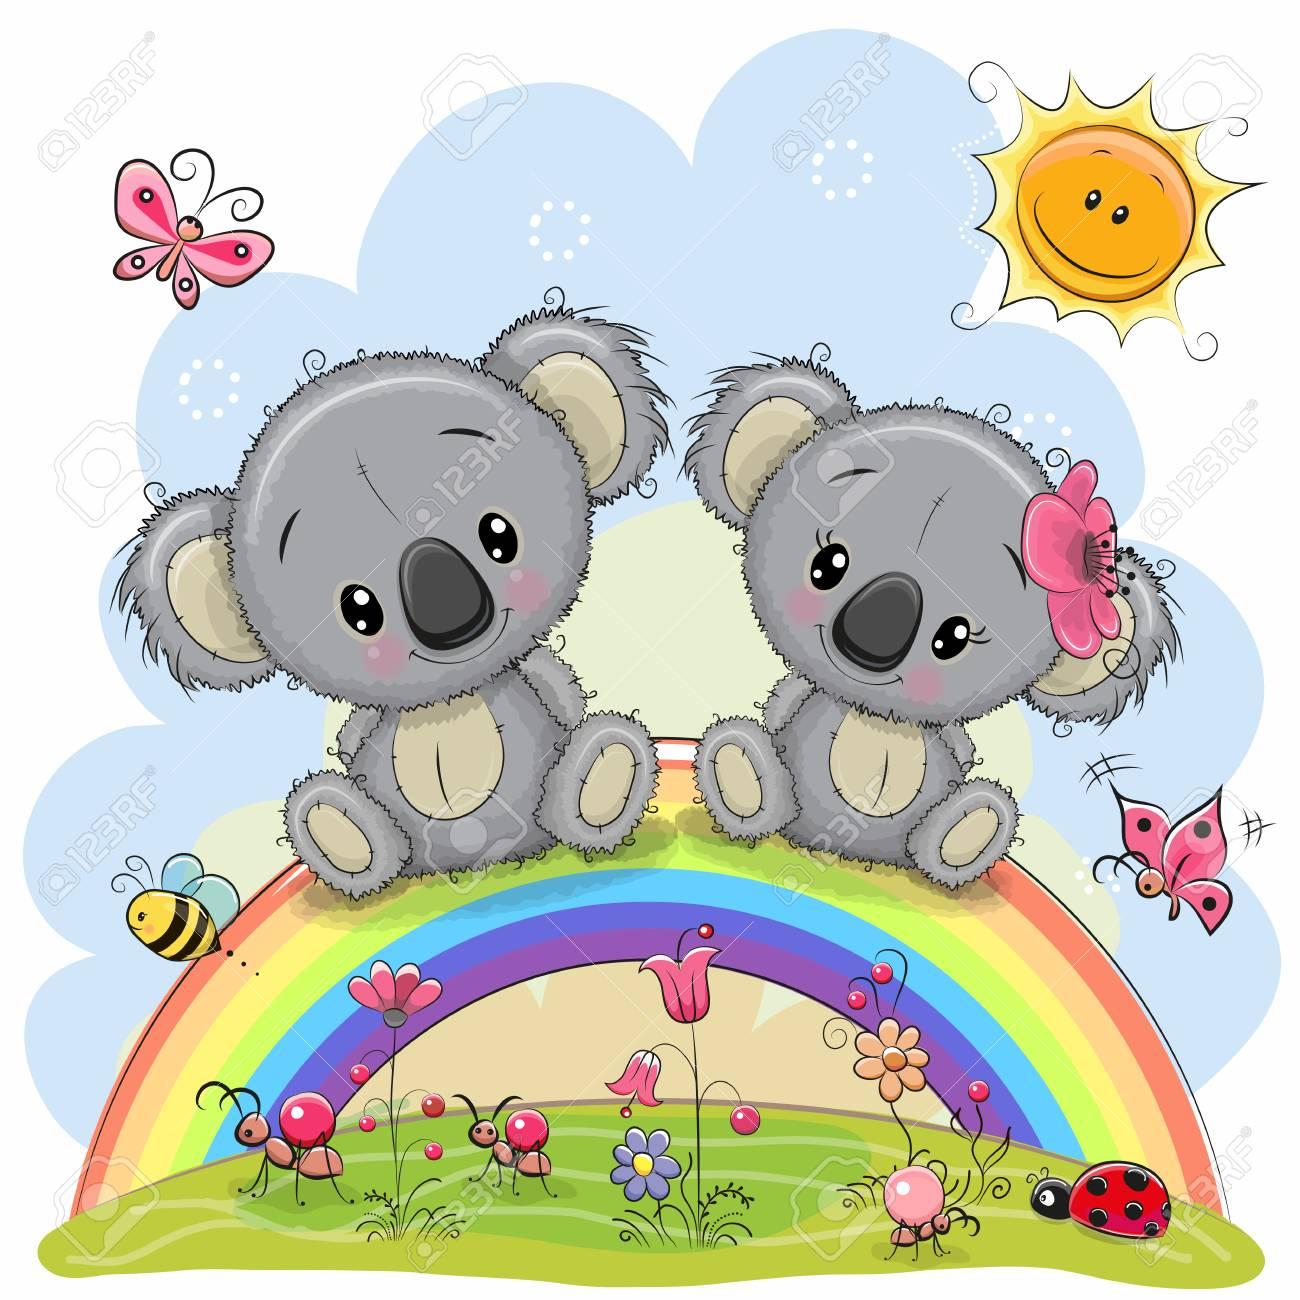 Two Cute Cartoon Koalas are sitting on the rainbow - 91828413